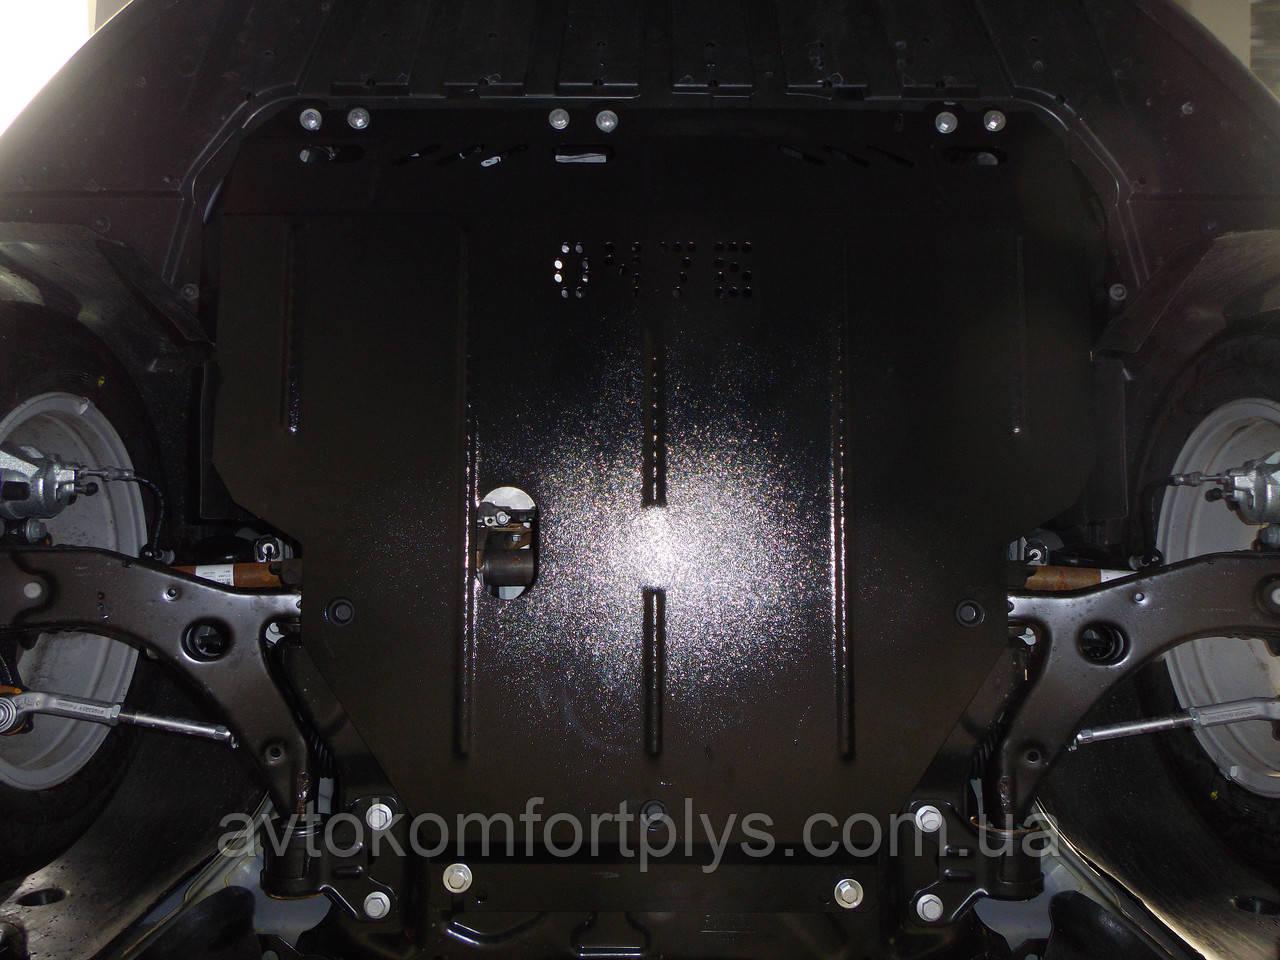 Металева (сталева) захист двигуна (картера) Ford Connect (2014-) (всі об'єми)